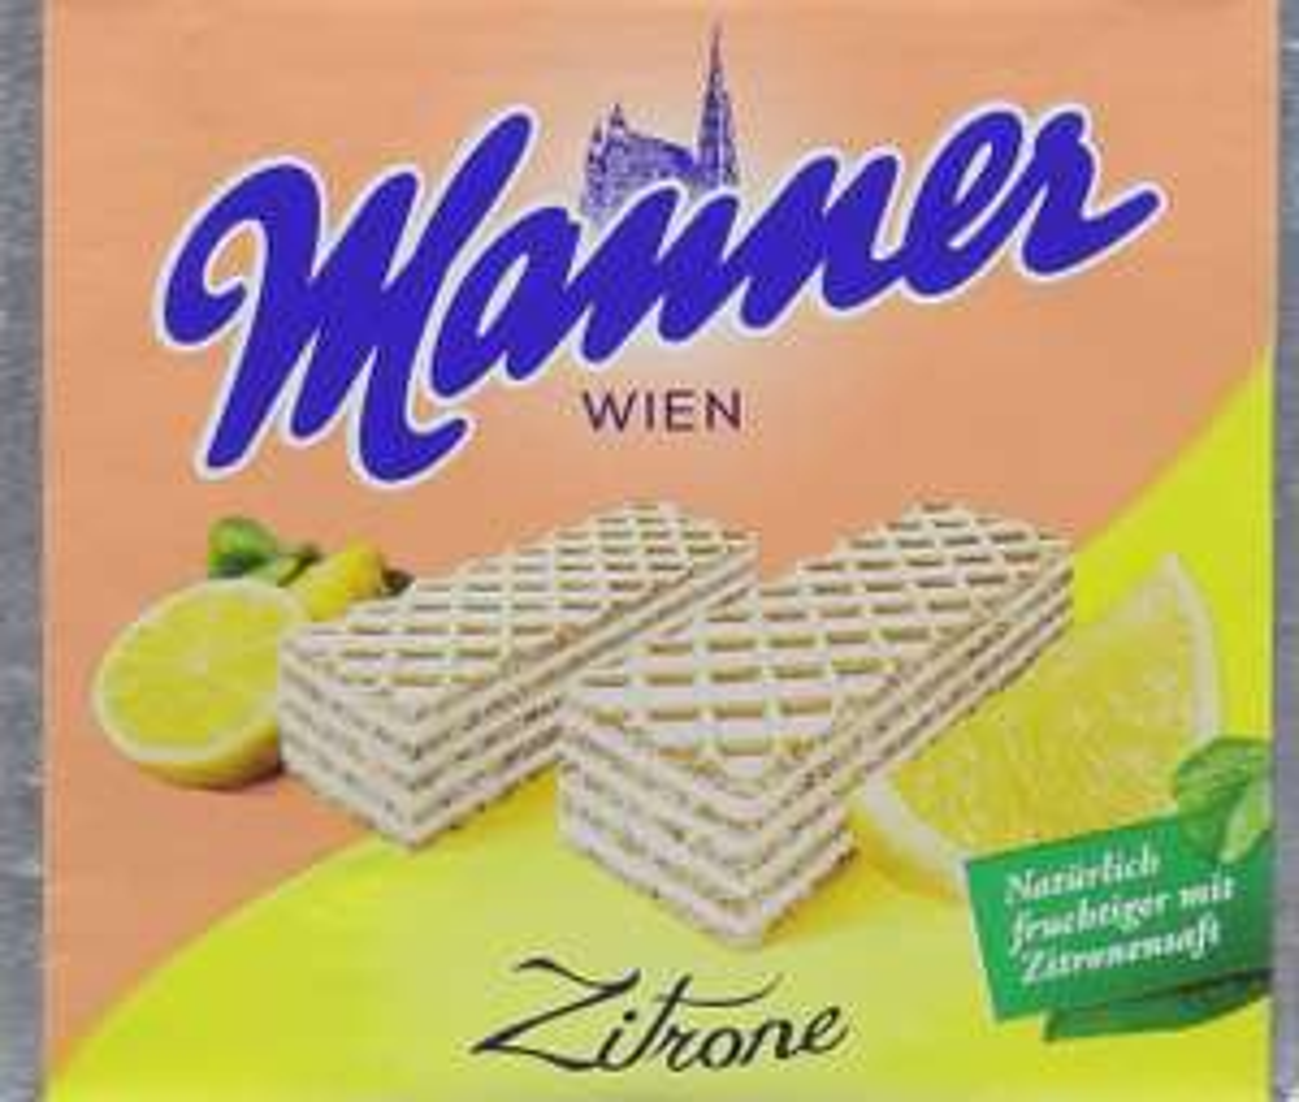 Manner Lemon Wafers75 g (Pack of 12) - £5.36 Prime / +£4.49 non Prime (£4.56/£5.09 S&S) @ Amazon